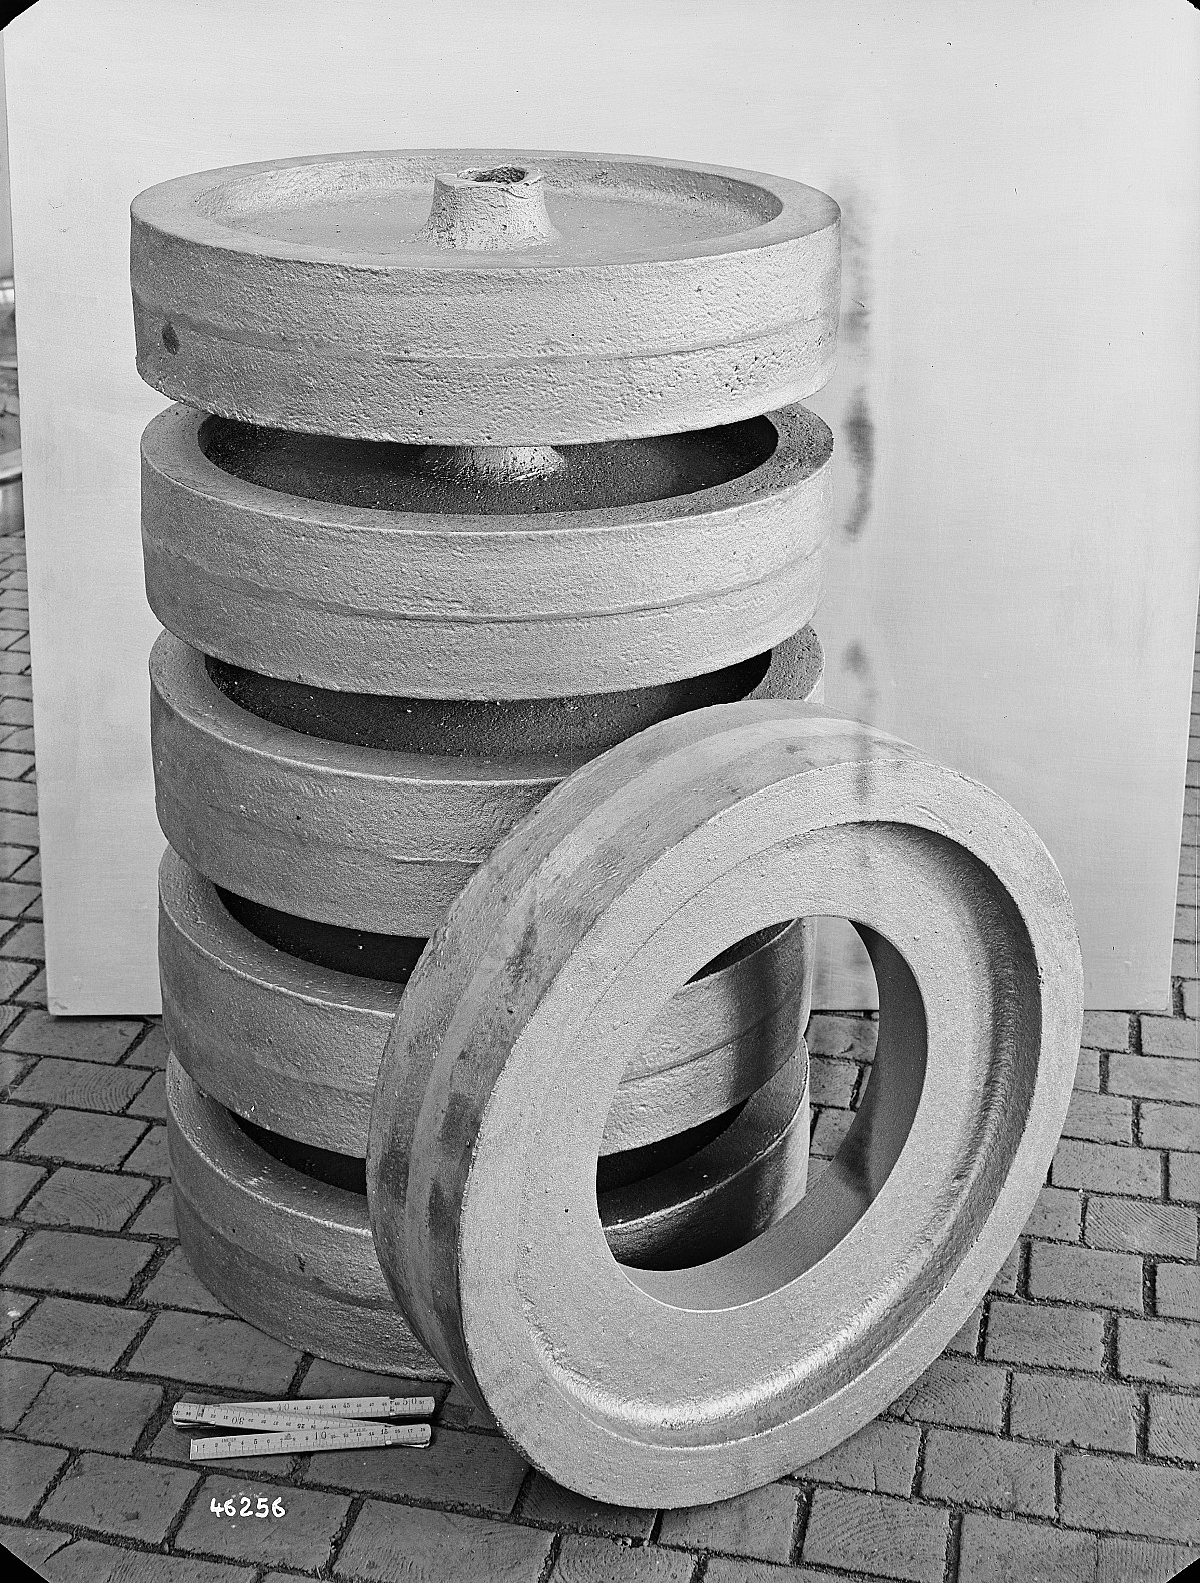 GFA 16/46256: Clamp rings Maag gearwheels